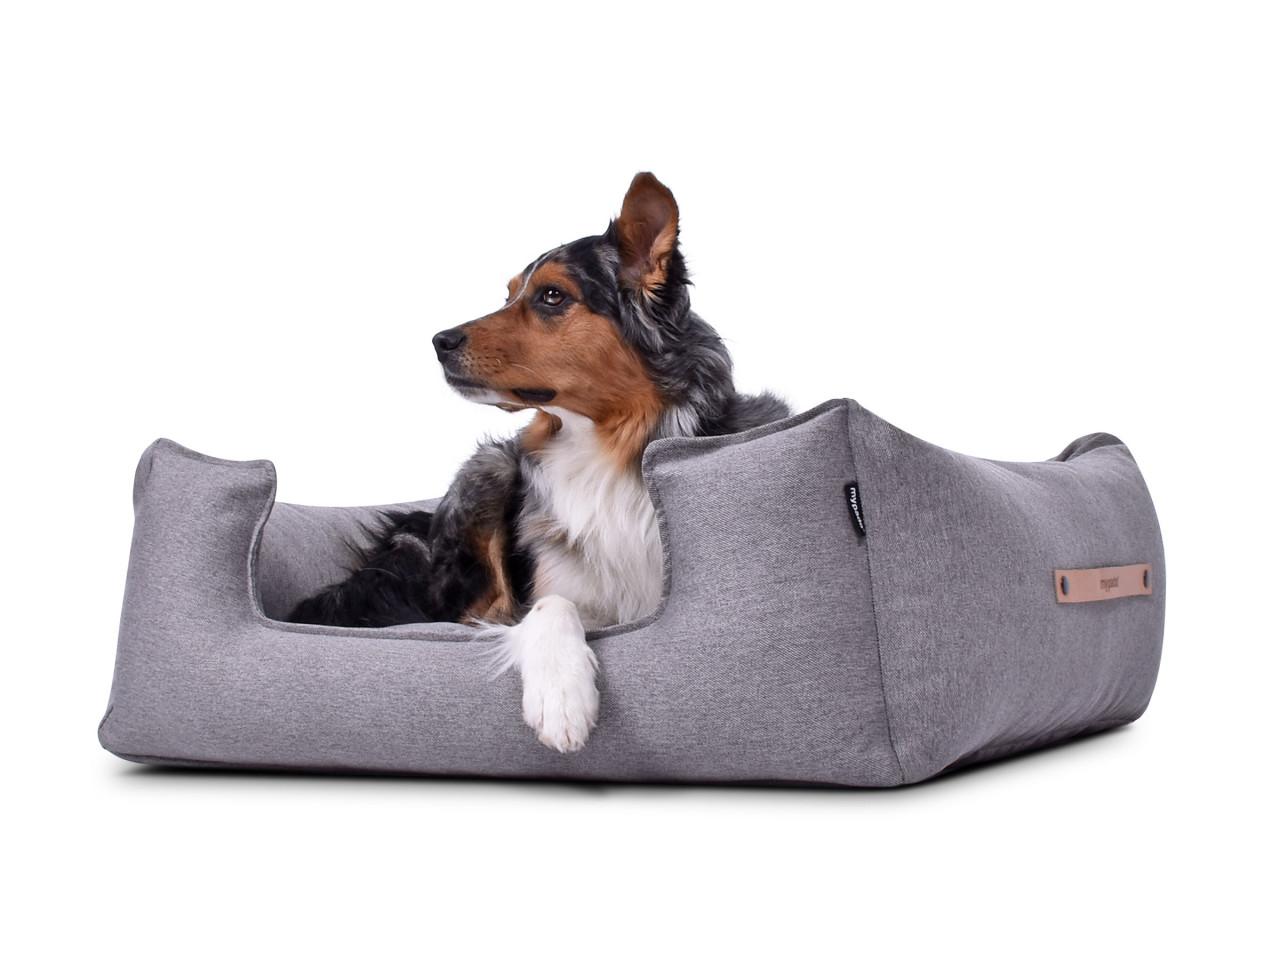 hundebett-NORDIC-basic-grey-hund